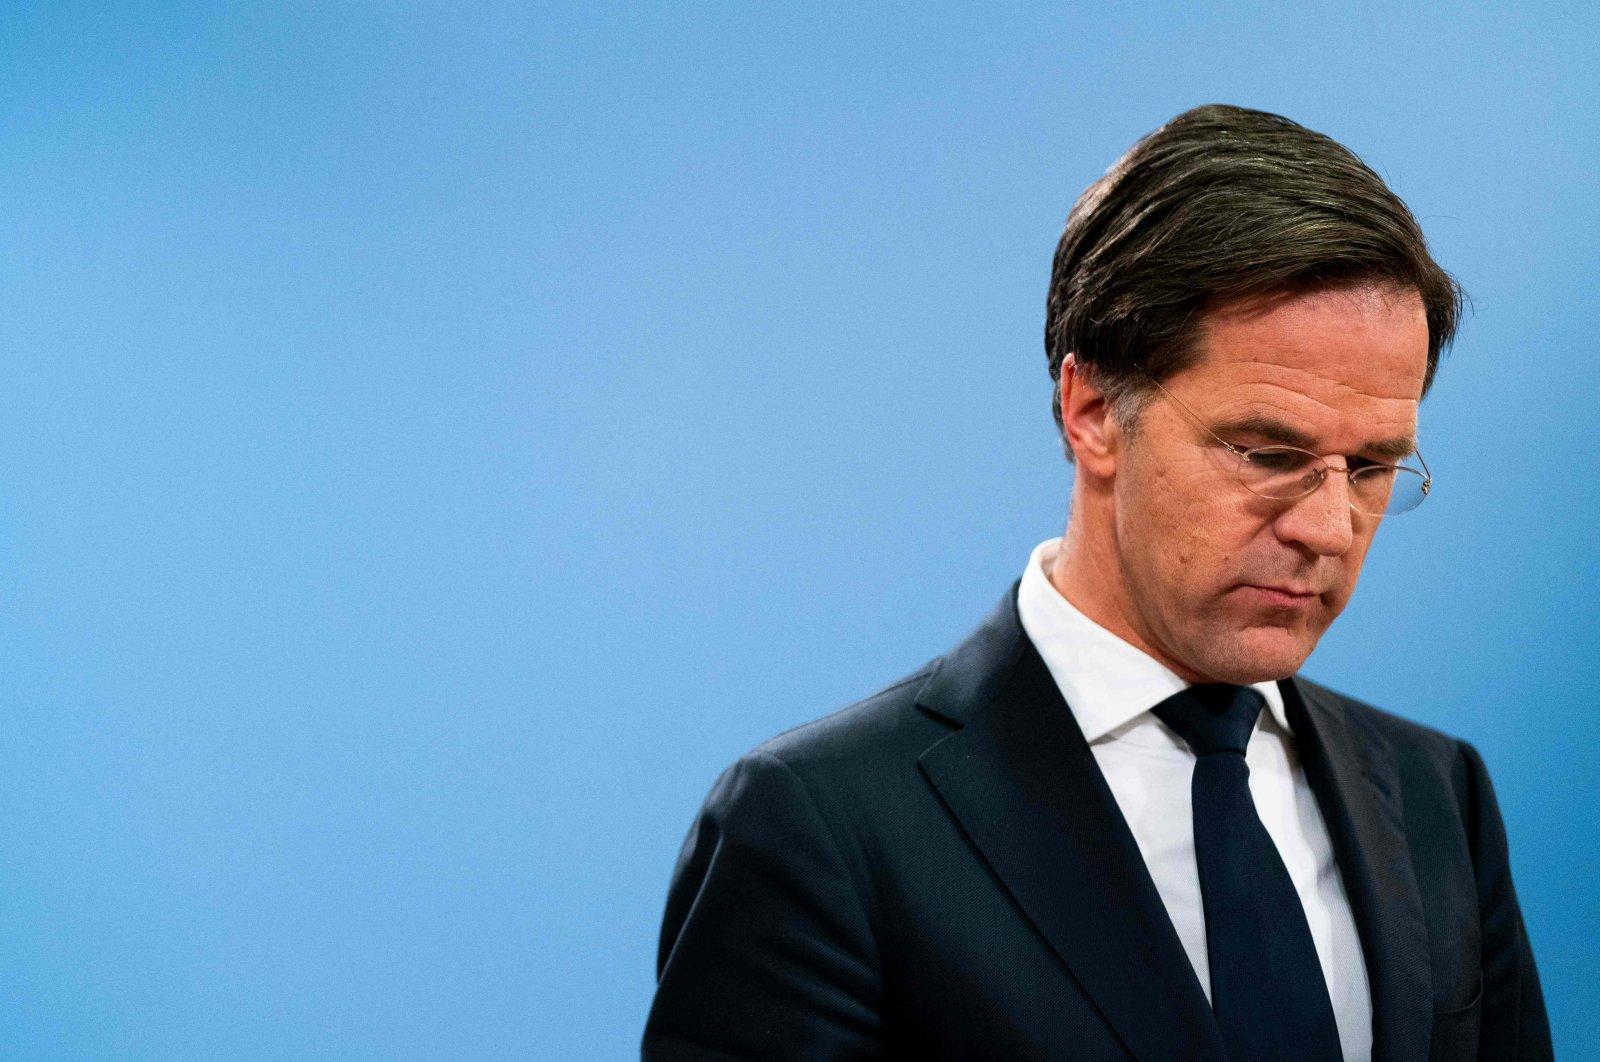 Dutch Prime Minister Mark Rutte speaks during a press conference in The Hague, Netherlands, Jan. 15, 2021. (AFP)